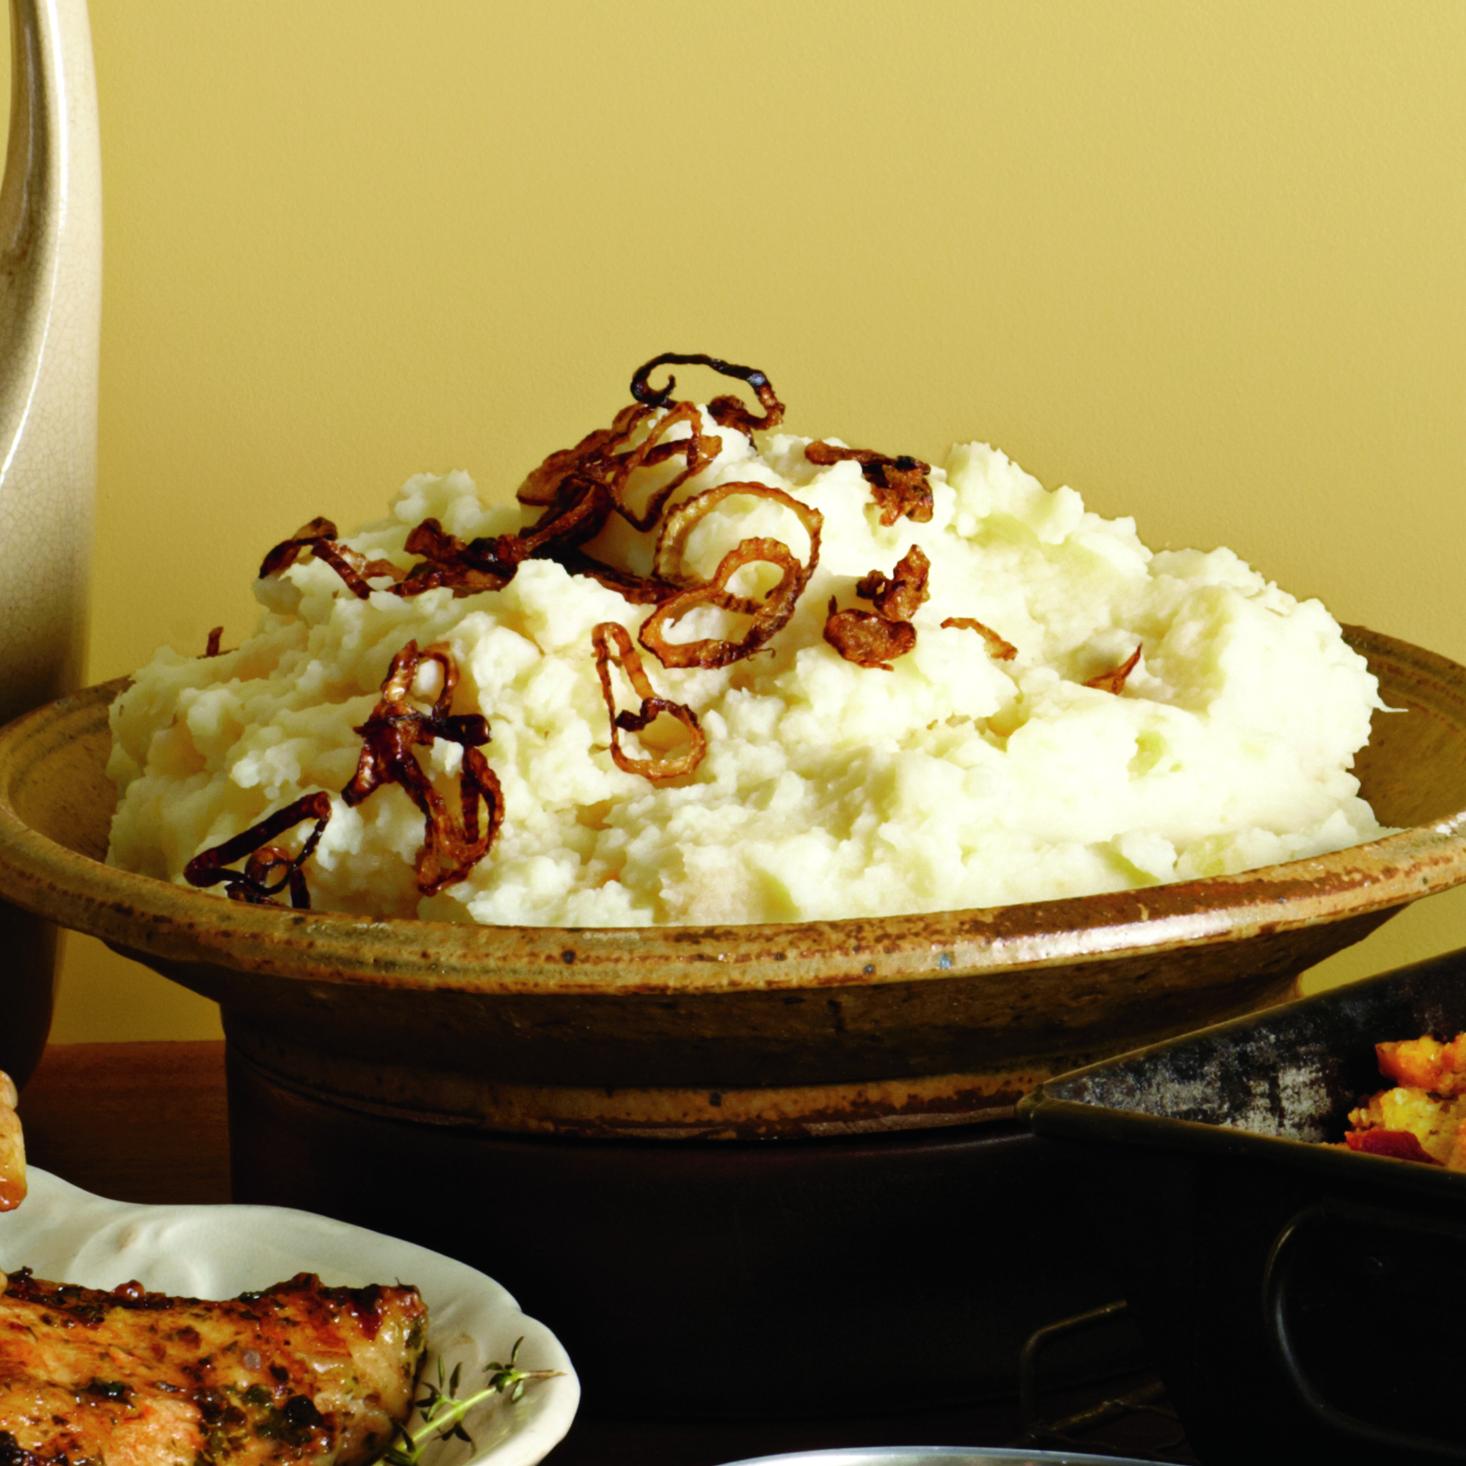 Potato-Turnip Mash with Crispy Fried Shallots